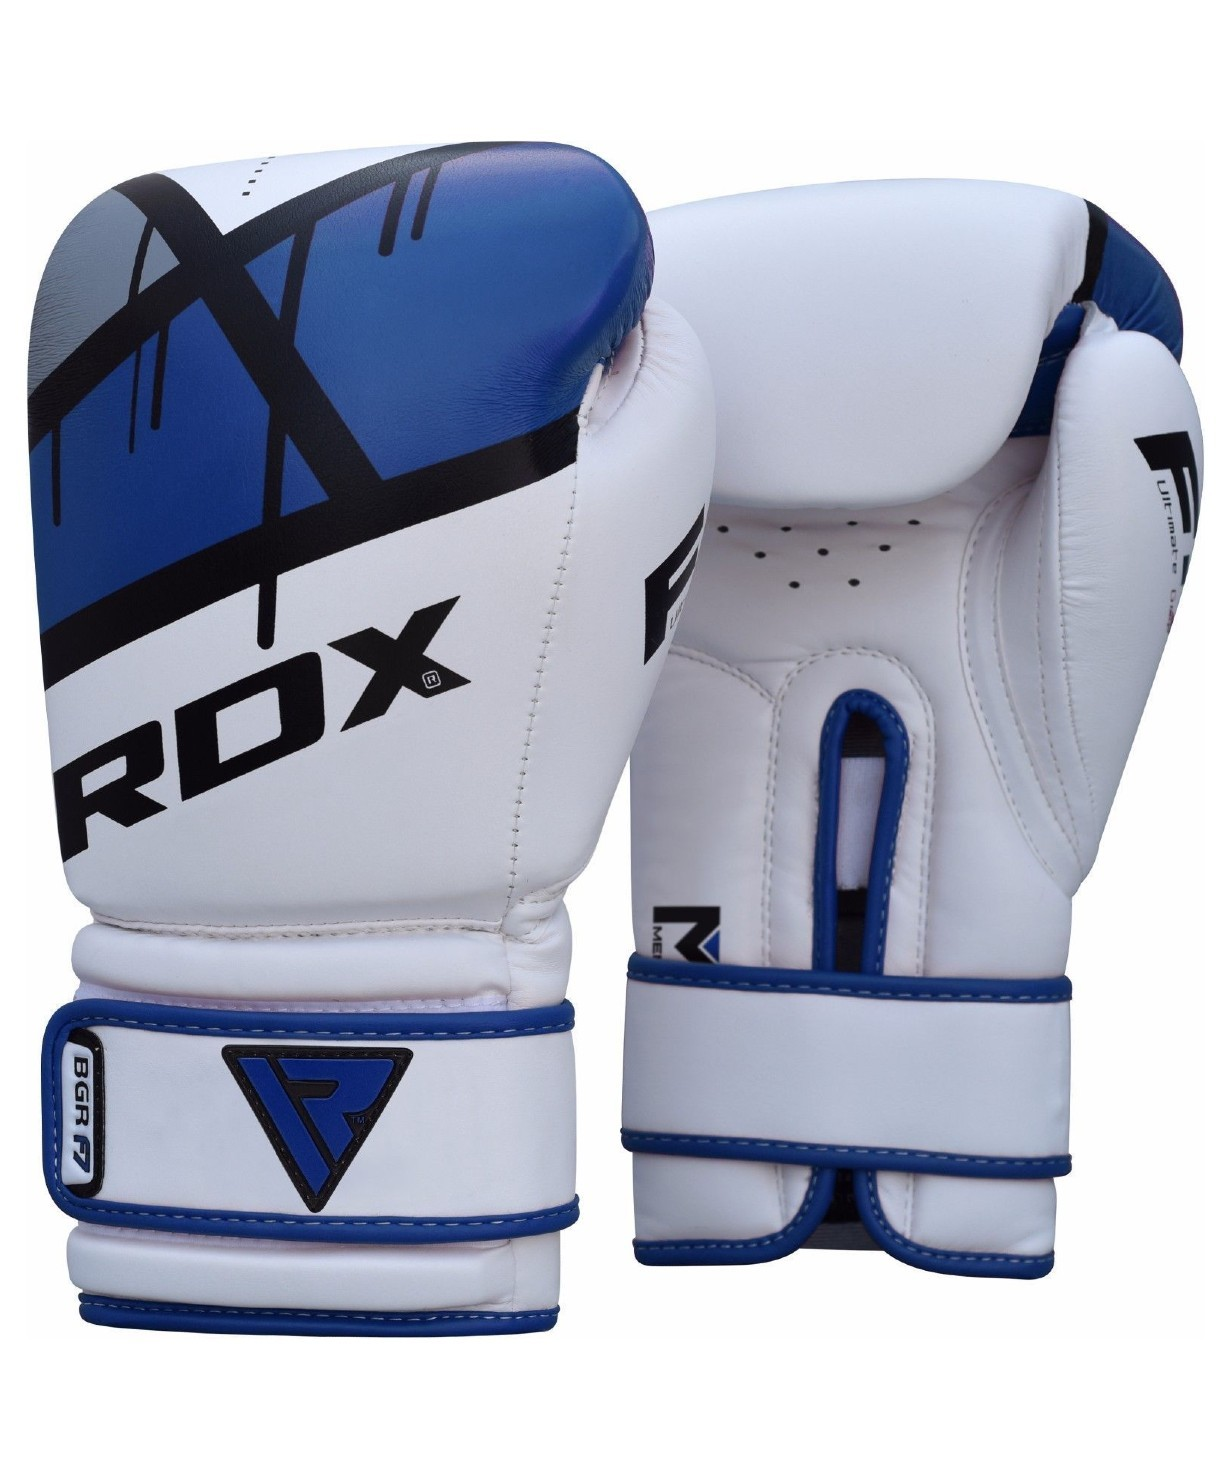 Перчатки Перчатки боксерские BGR-F7 RDX cb5340e1b219b821df52cbb2a867334e.jpg